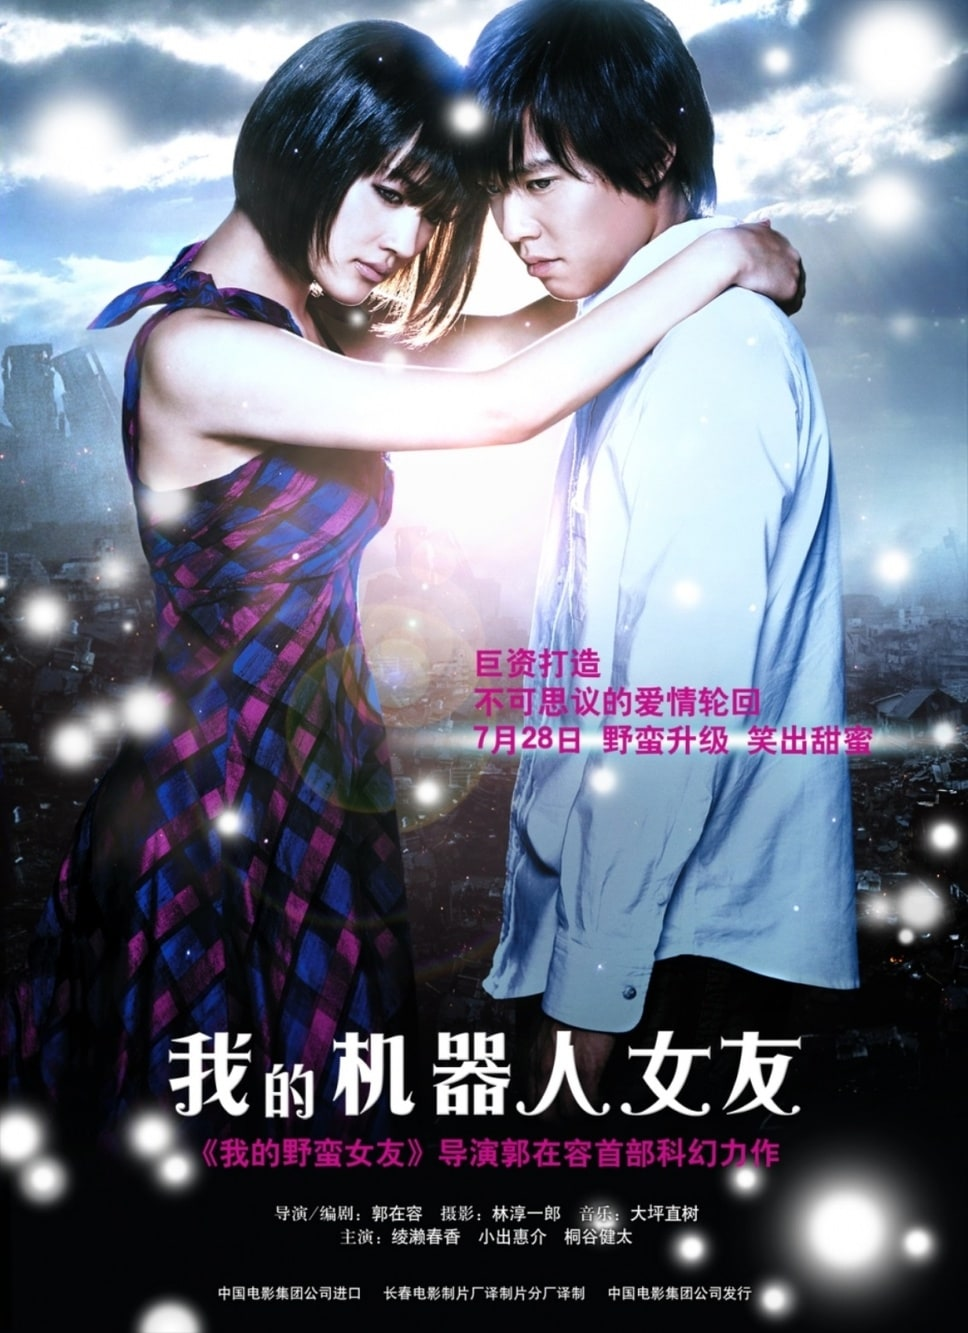 Cyborg girl japanese movie